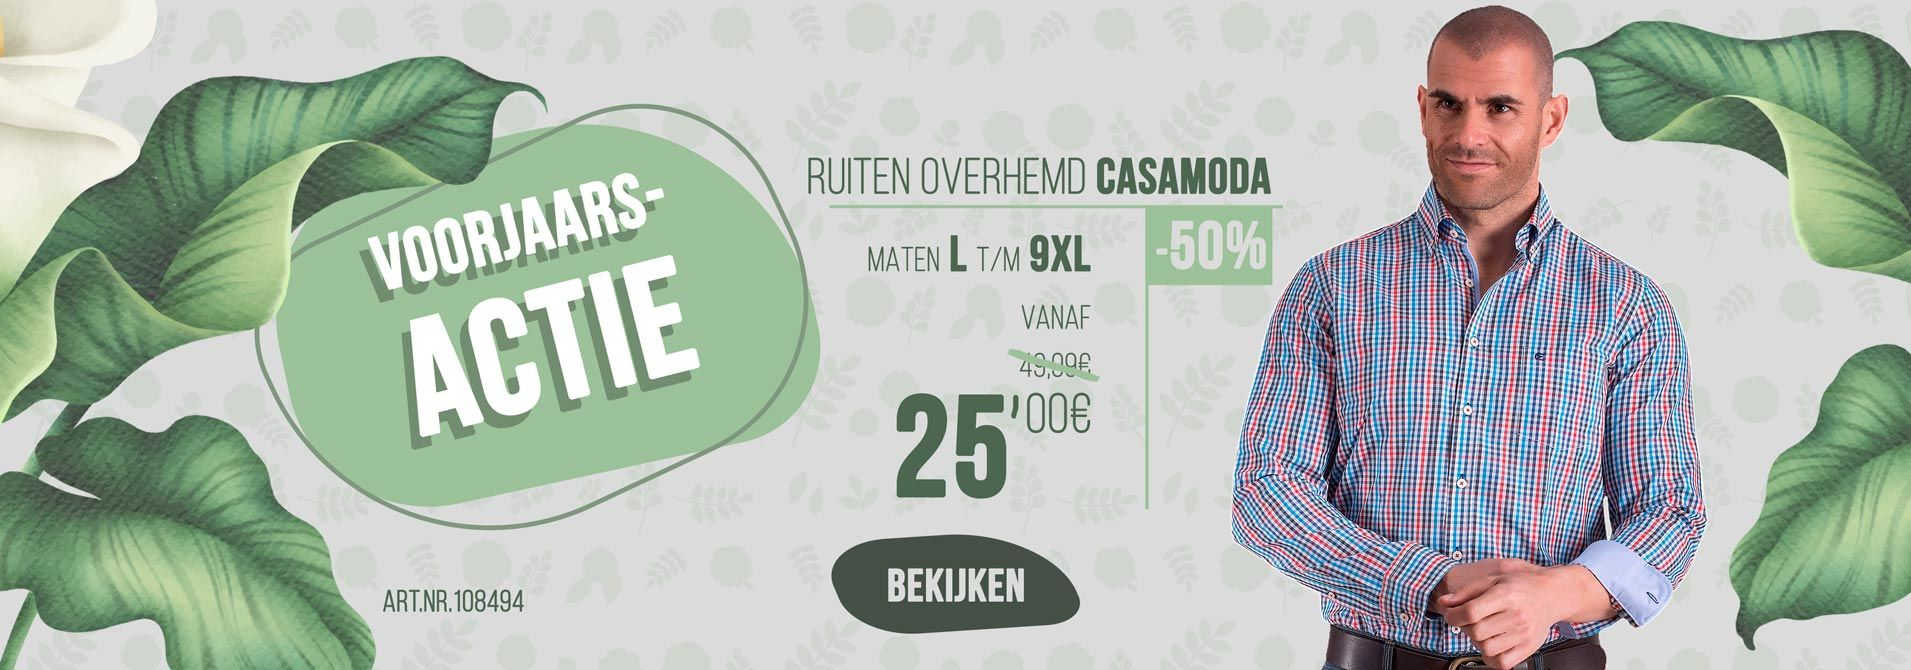 Ruiten overhemd van Casamoda